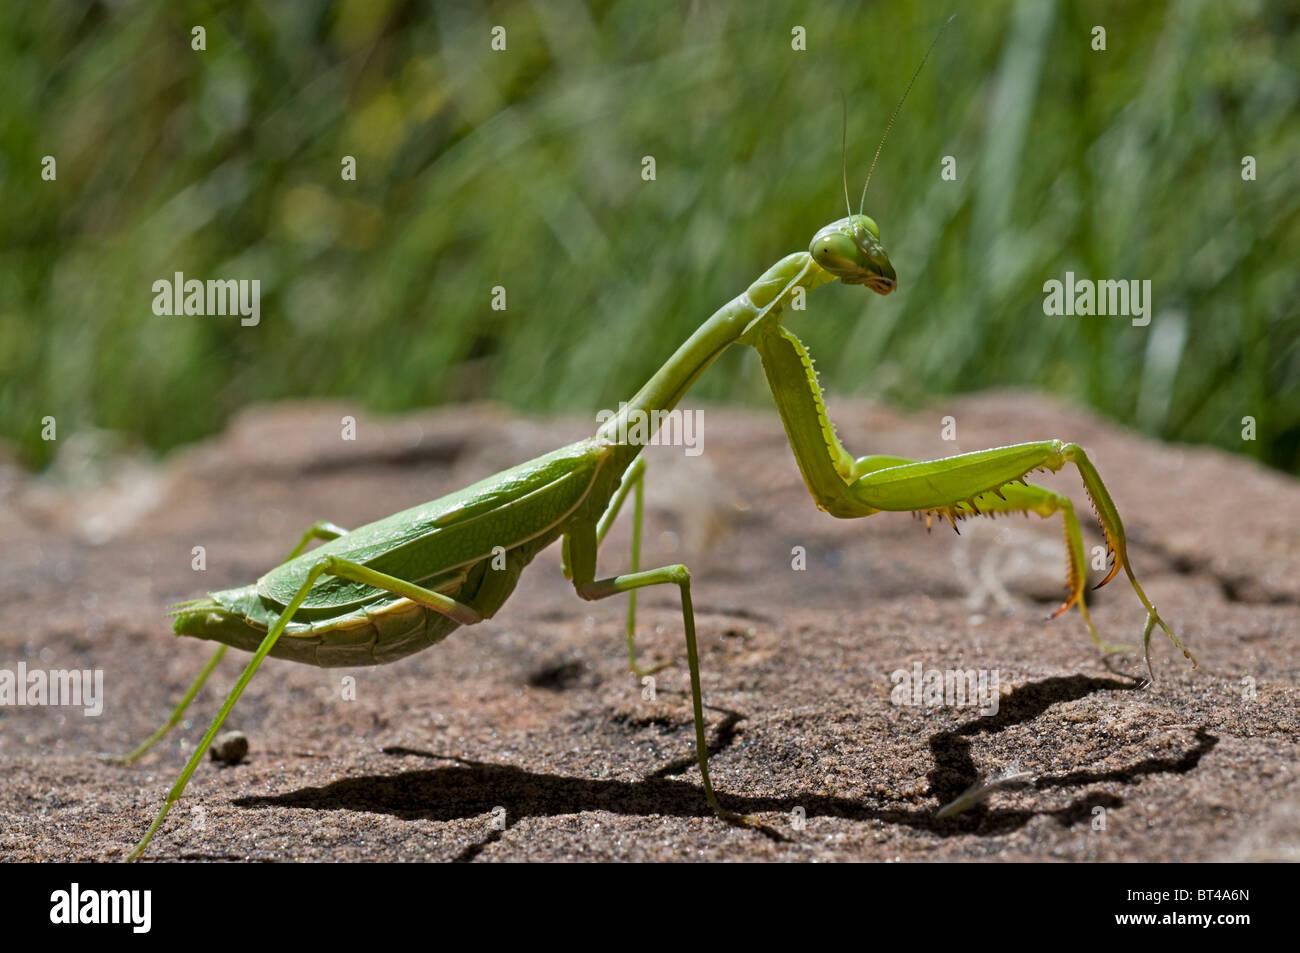 Green Preying Mantis - Stock Image